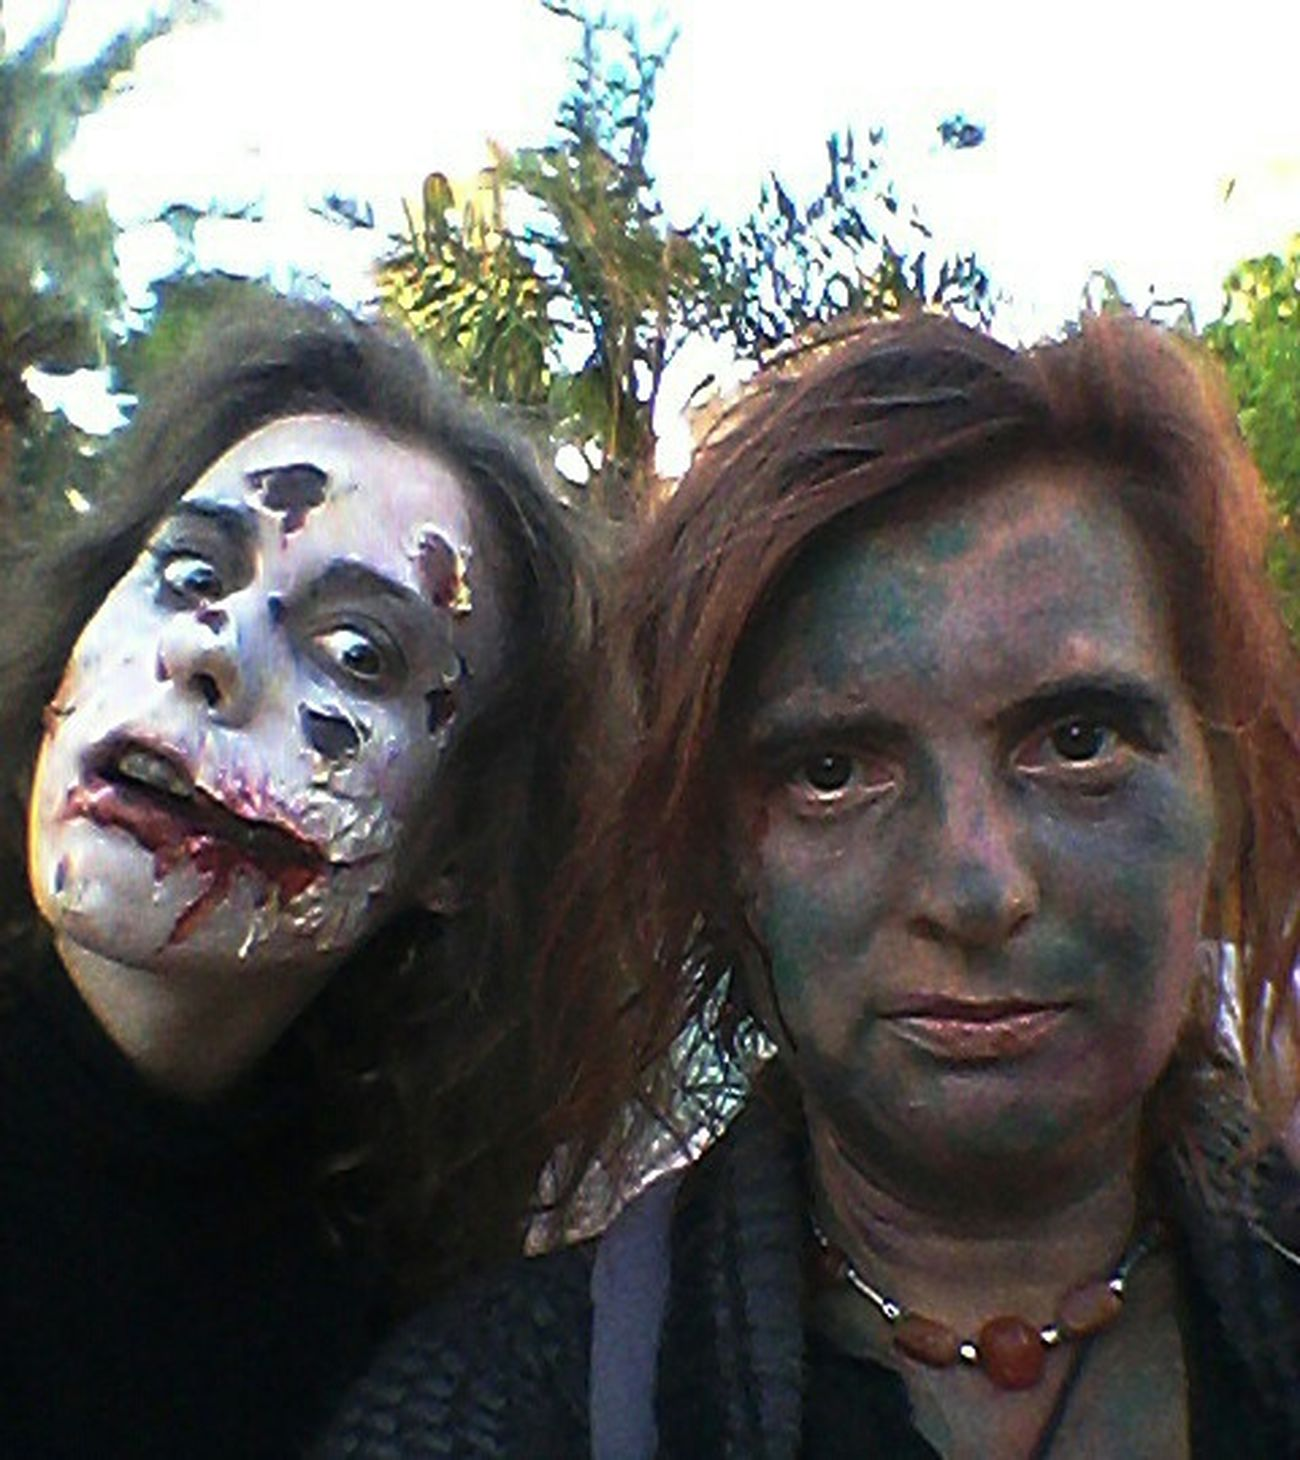 Torrevieja Halloween Zombie Torrevieja 2015 Zombieparade Costumes Makeup Halloween Horrors Happy Halloween Family